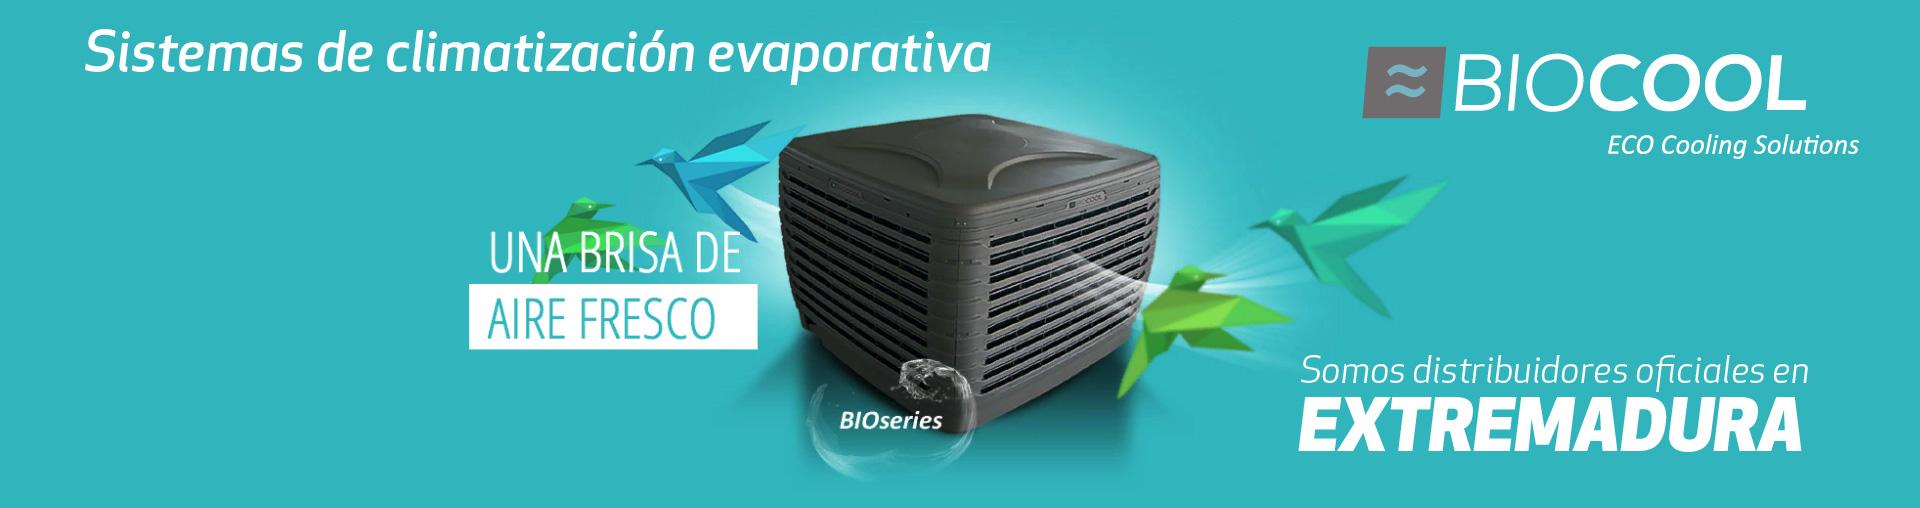 presentacion-biocool